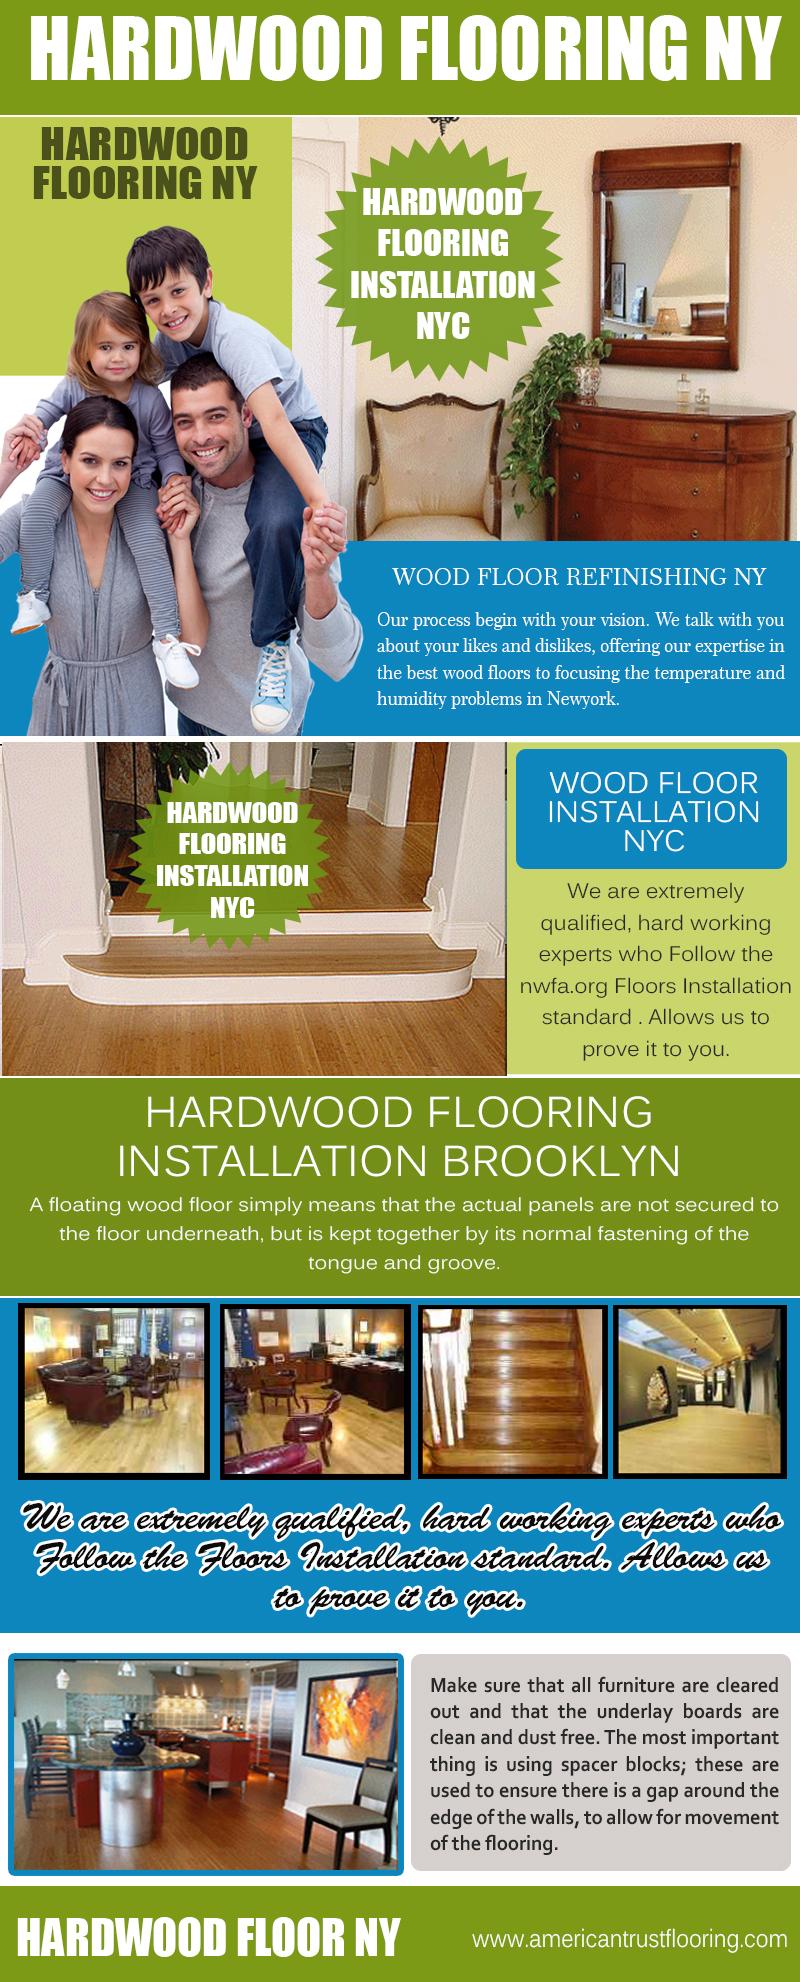 Hardwood Flooring Ny